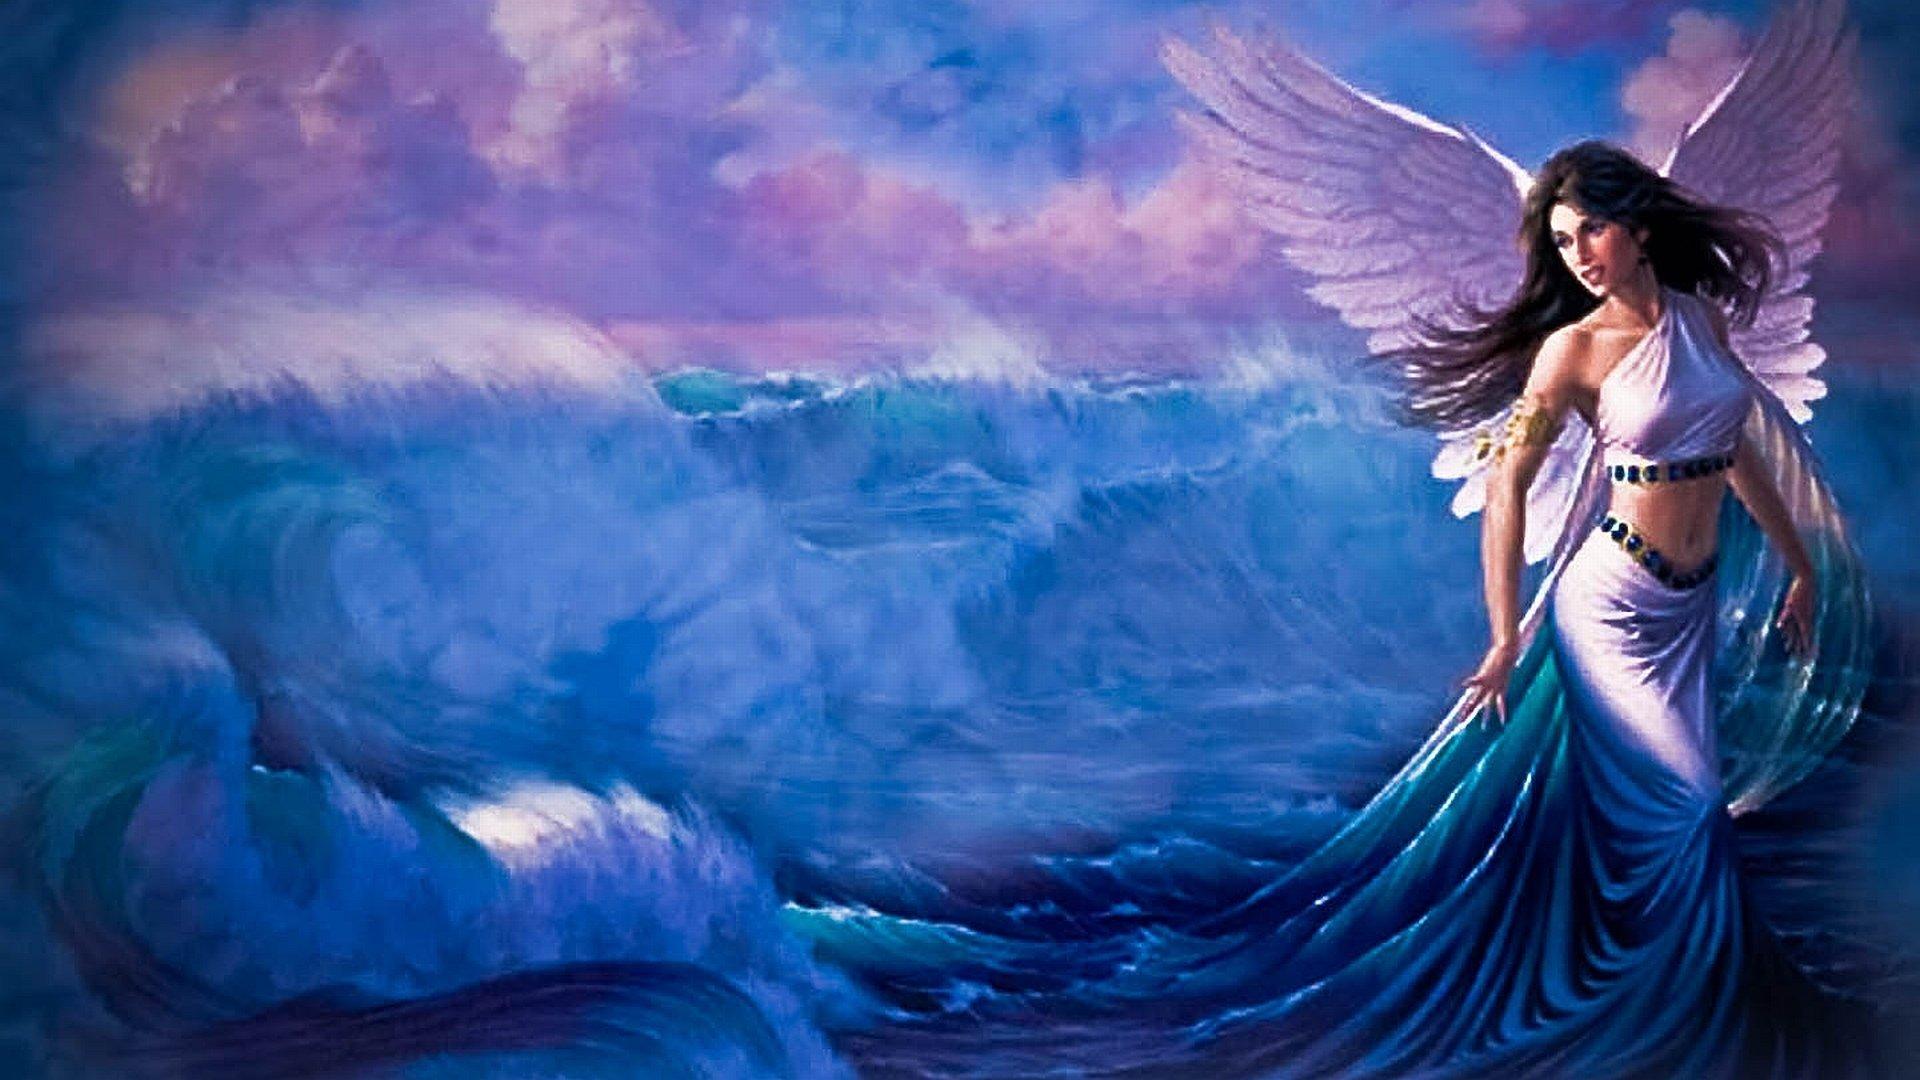 Angel HD Wallpaper   Background Image   1920x1080   ID ...